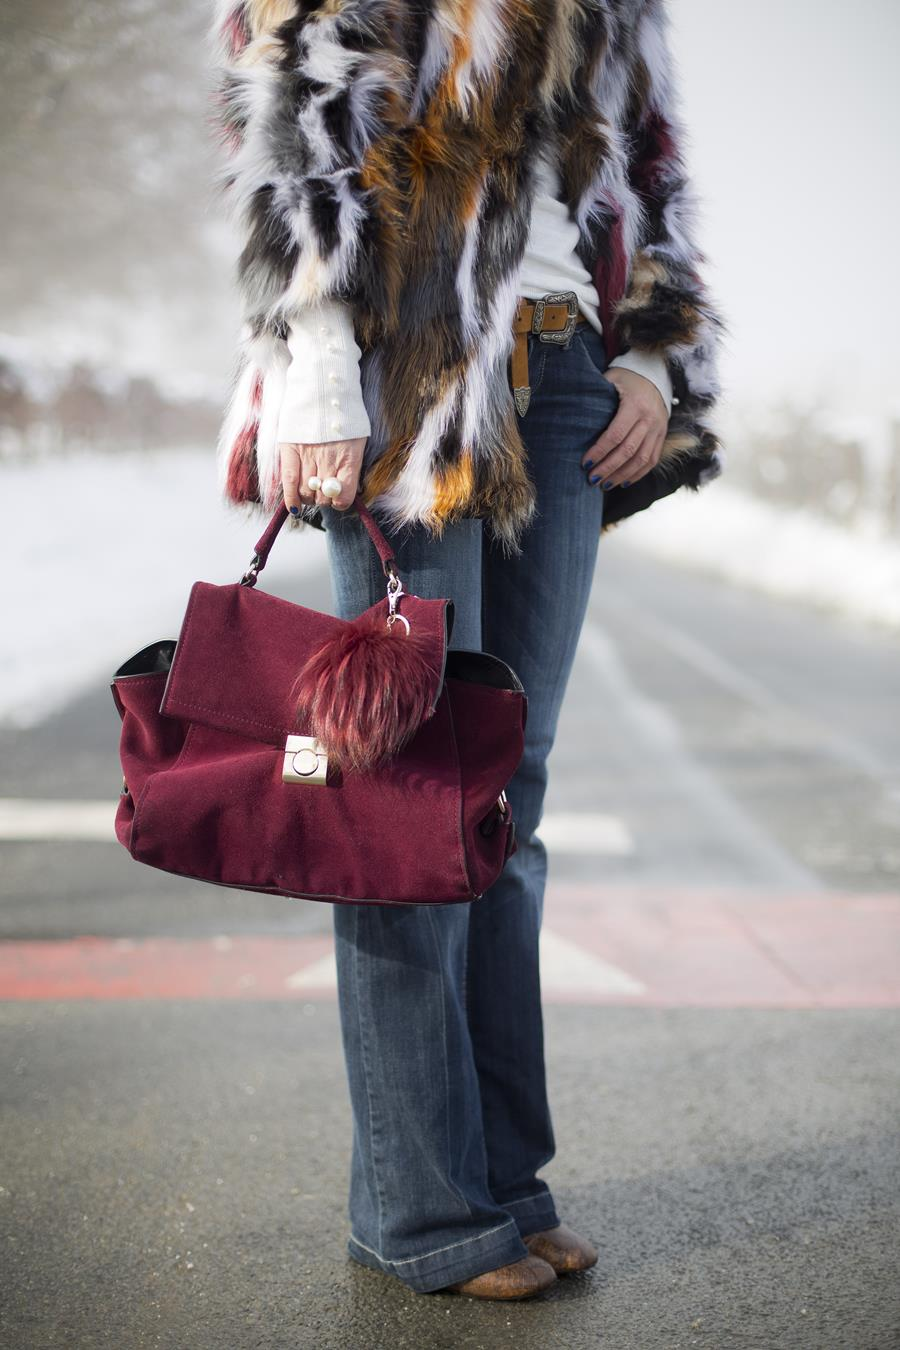 Rebeca Valdivia, personal shopper, estilista, stilist, asesora de imagen, denim, pantalón campana, bell pants, yety, abrigo pelo, sintético, faux fur coat, lizartza, bolso cartera, botín serpiente, boots, perlas, pearls, snow, nieve,